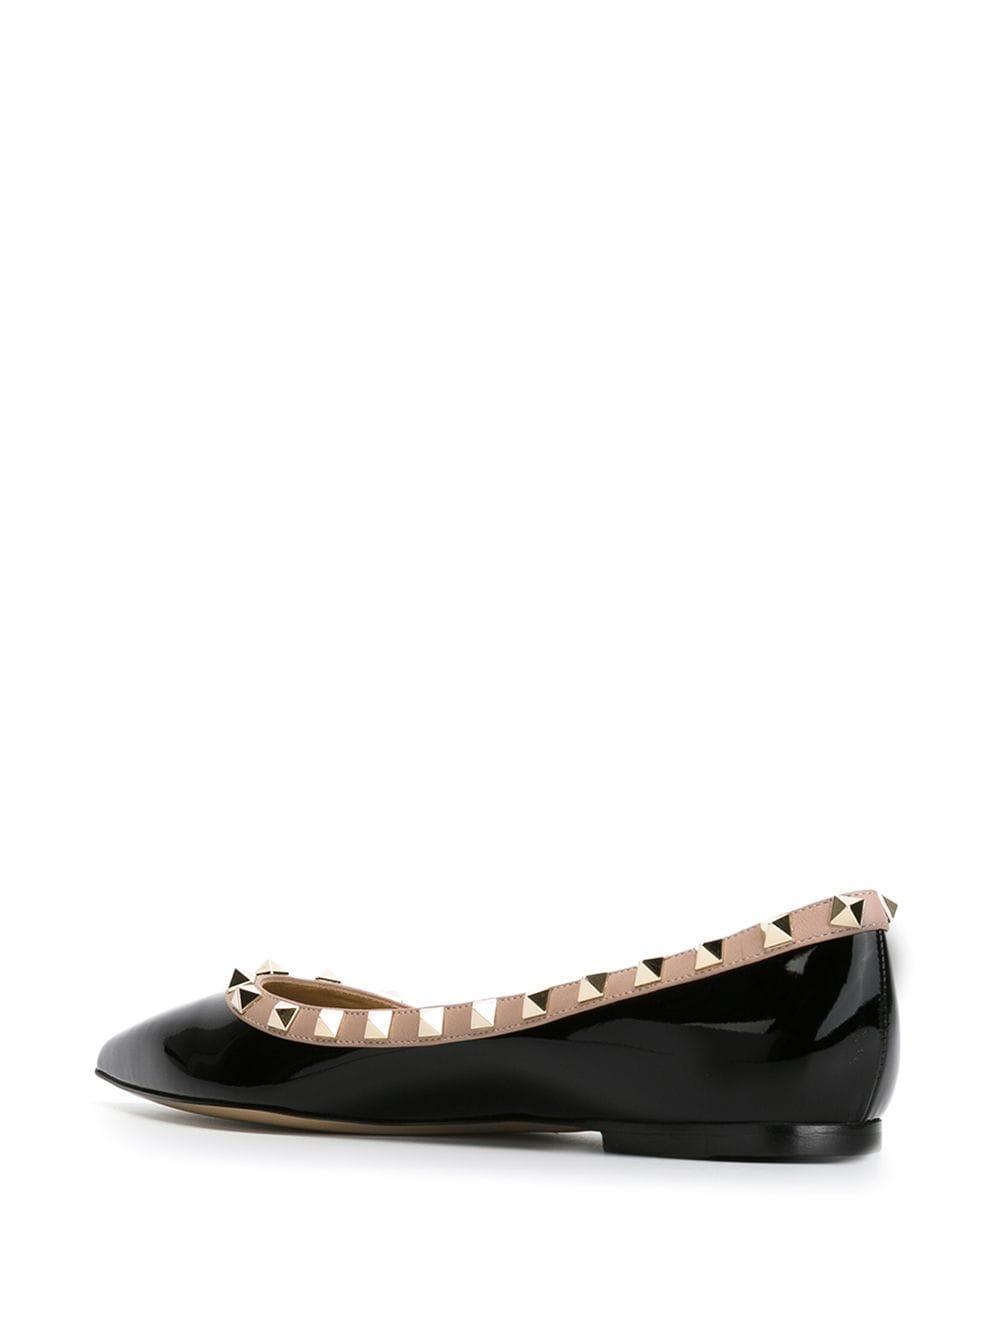 Ballerina shoes VALENTINO GARAVANI      UW2S0403VNWN91